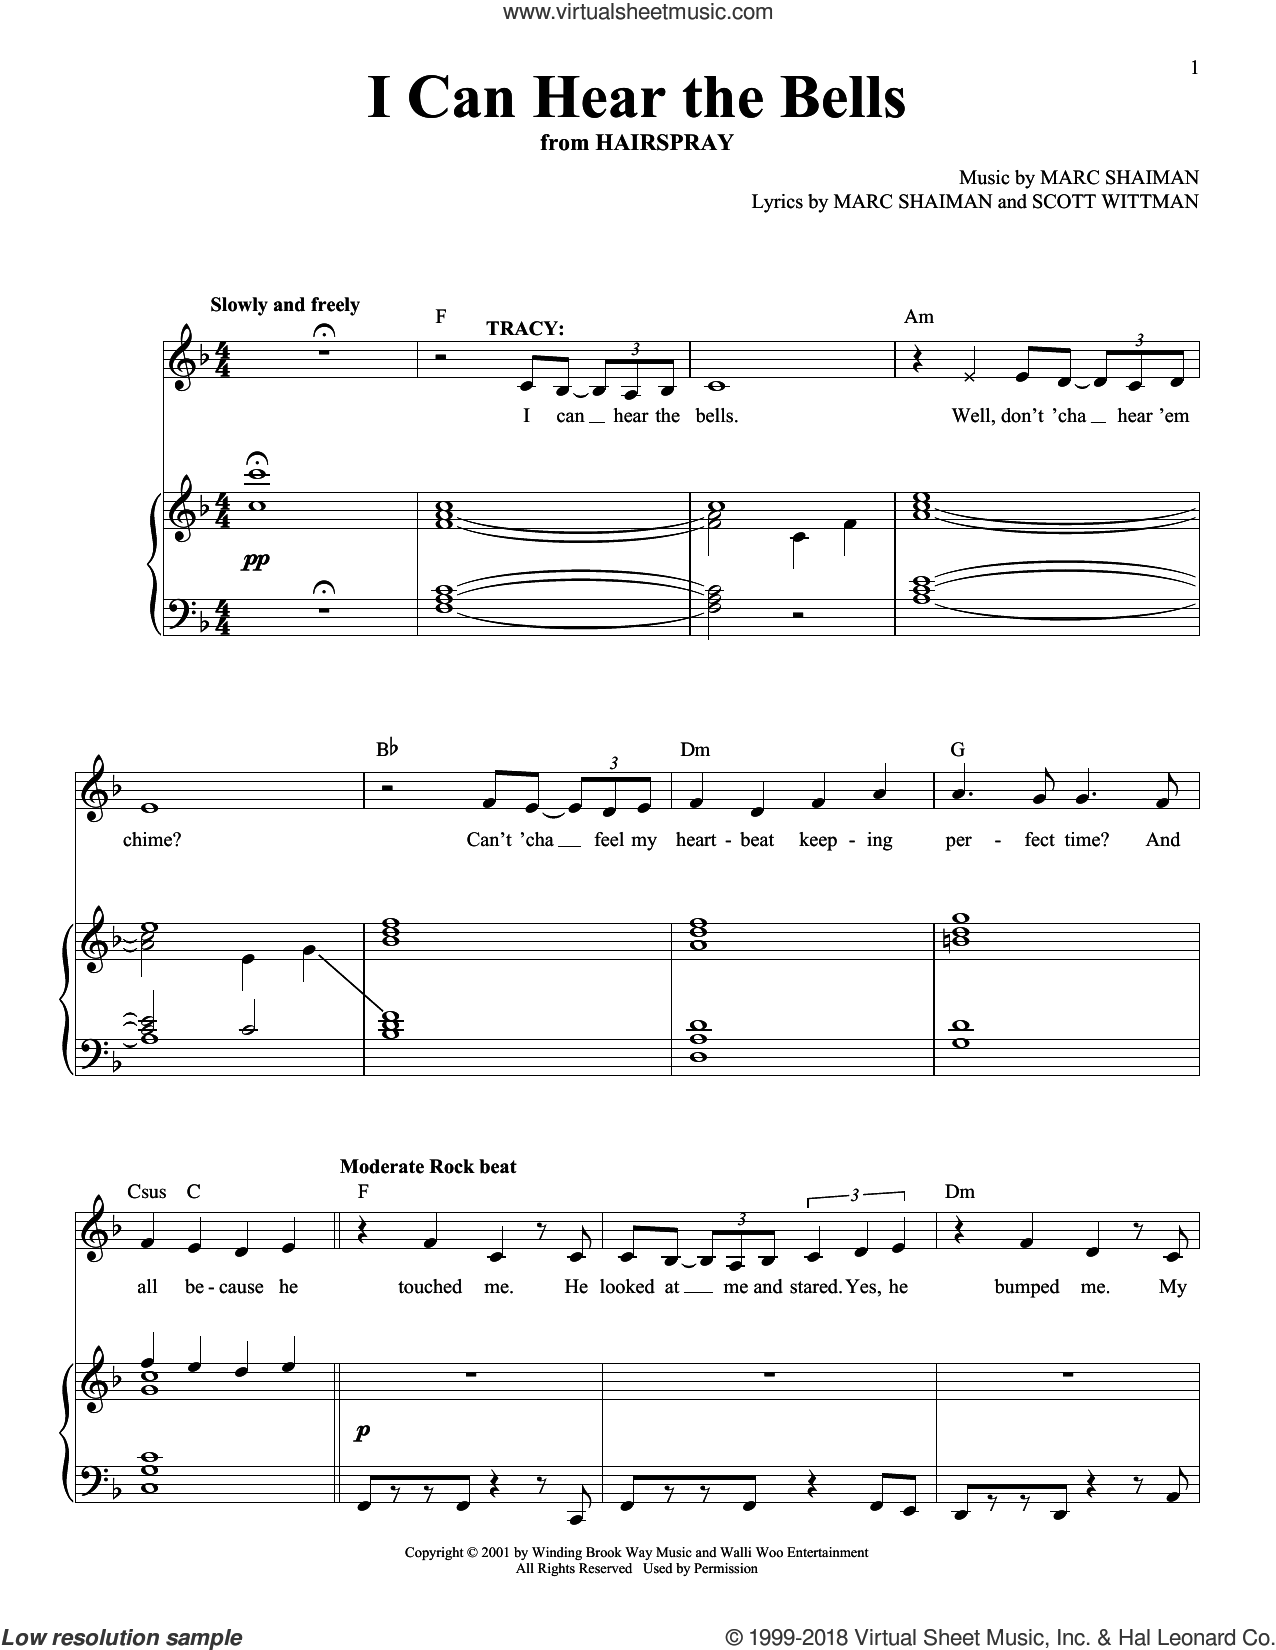 I Can Hear The Bells sheet music for voice and piano by Marc Shaiman & Scott Wittman, Marc Shaiman and Scott Wittman, intermediate skill level